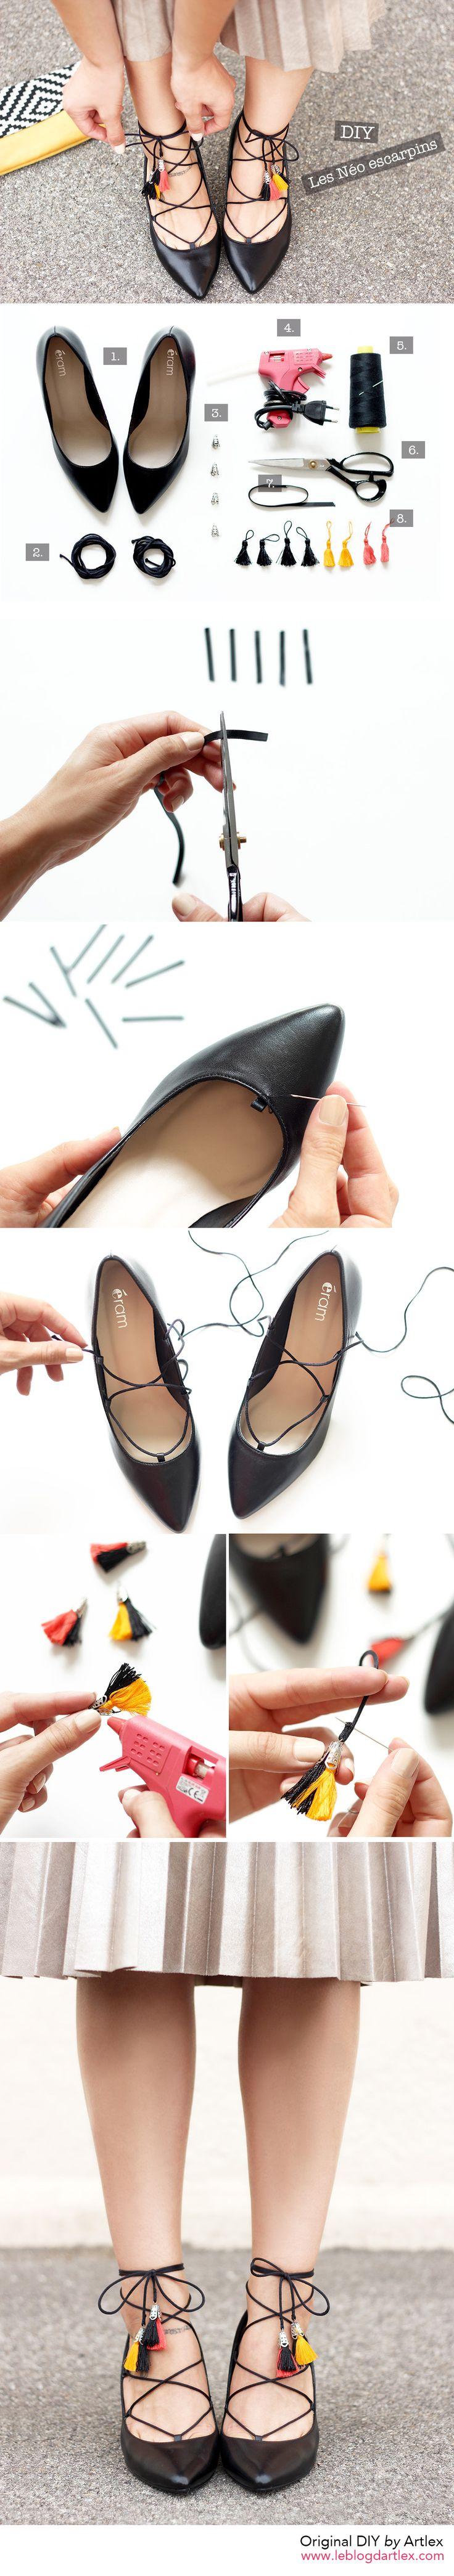 Laced shoes DIY // Blog DIY Artlex http://www.leblogdartlex.com/diy-chaussures-lacees-pompons/